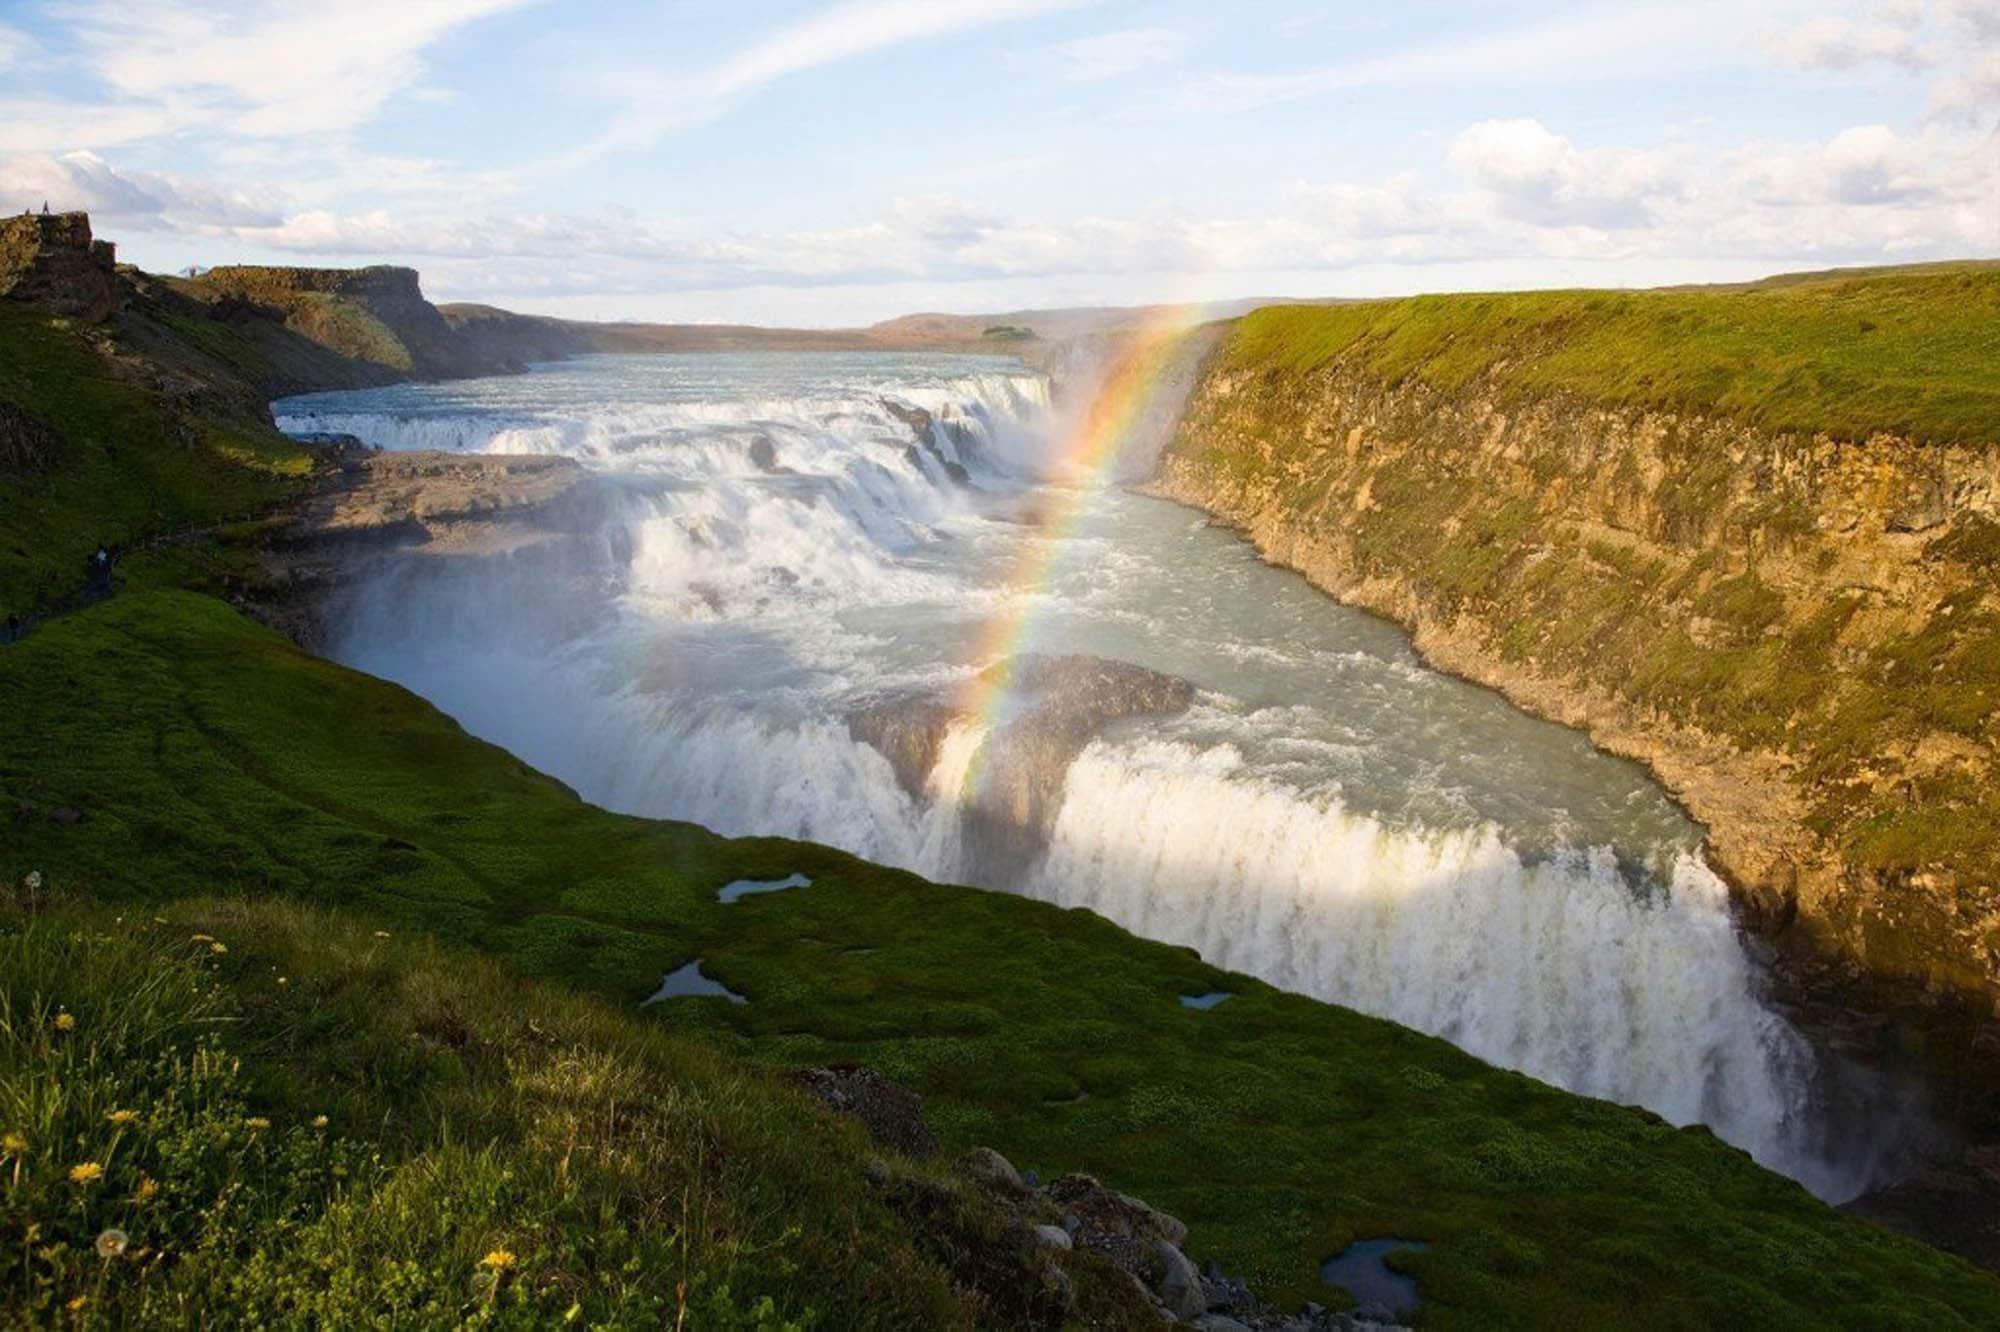 golden circle day tour from reykjavik